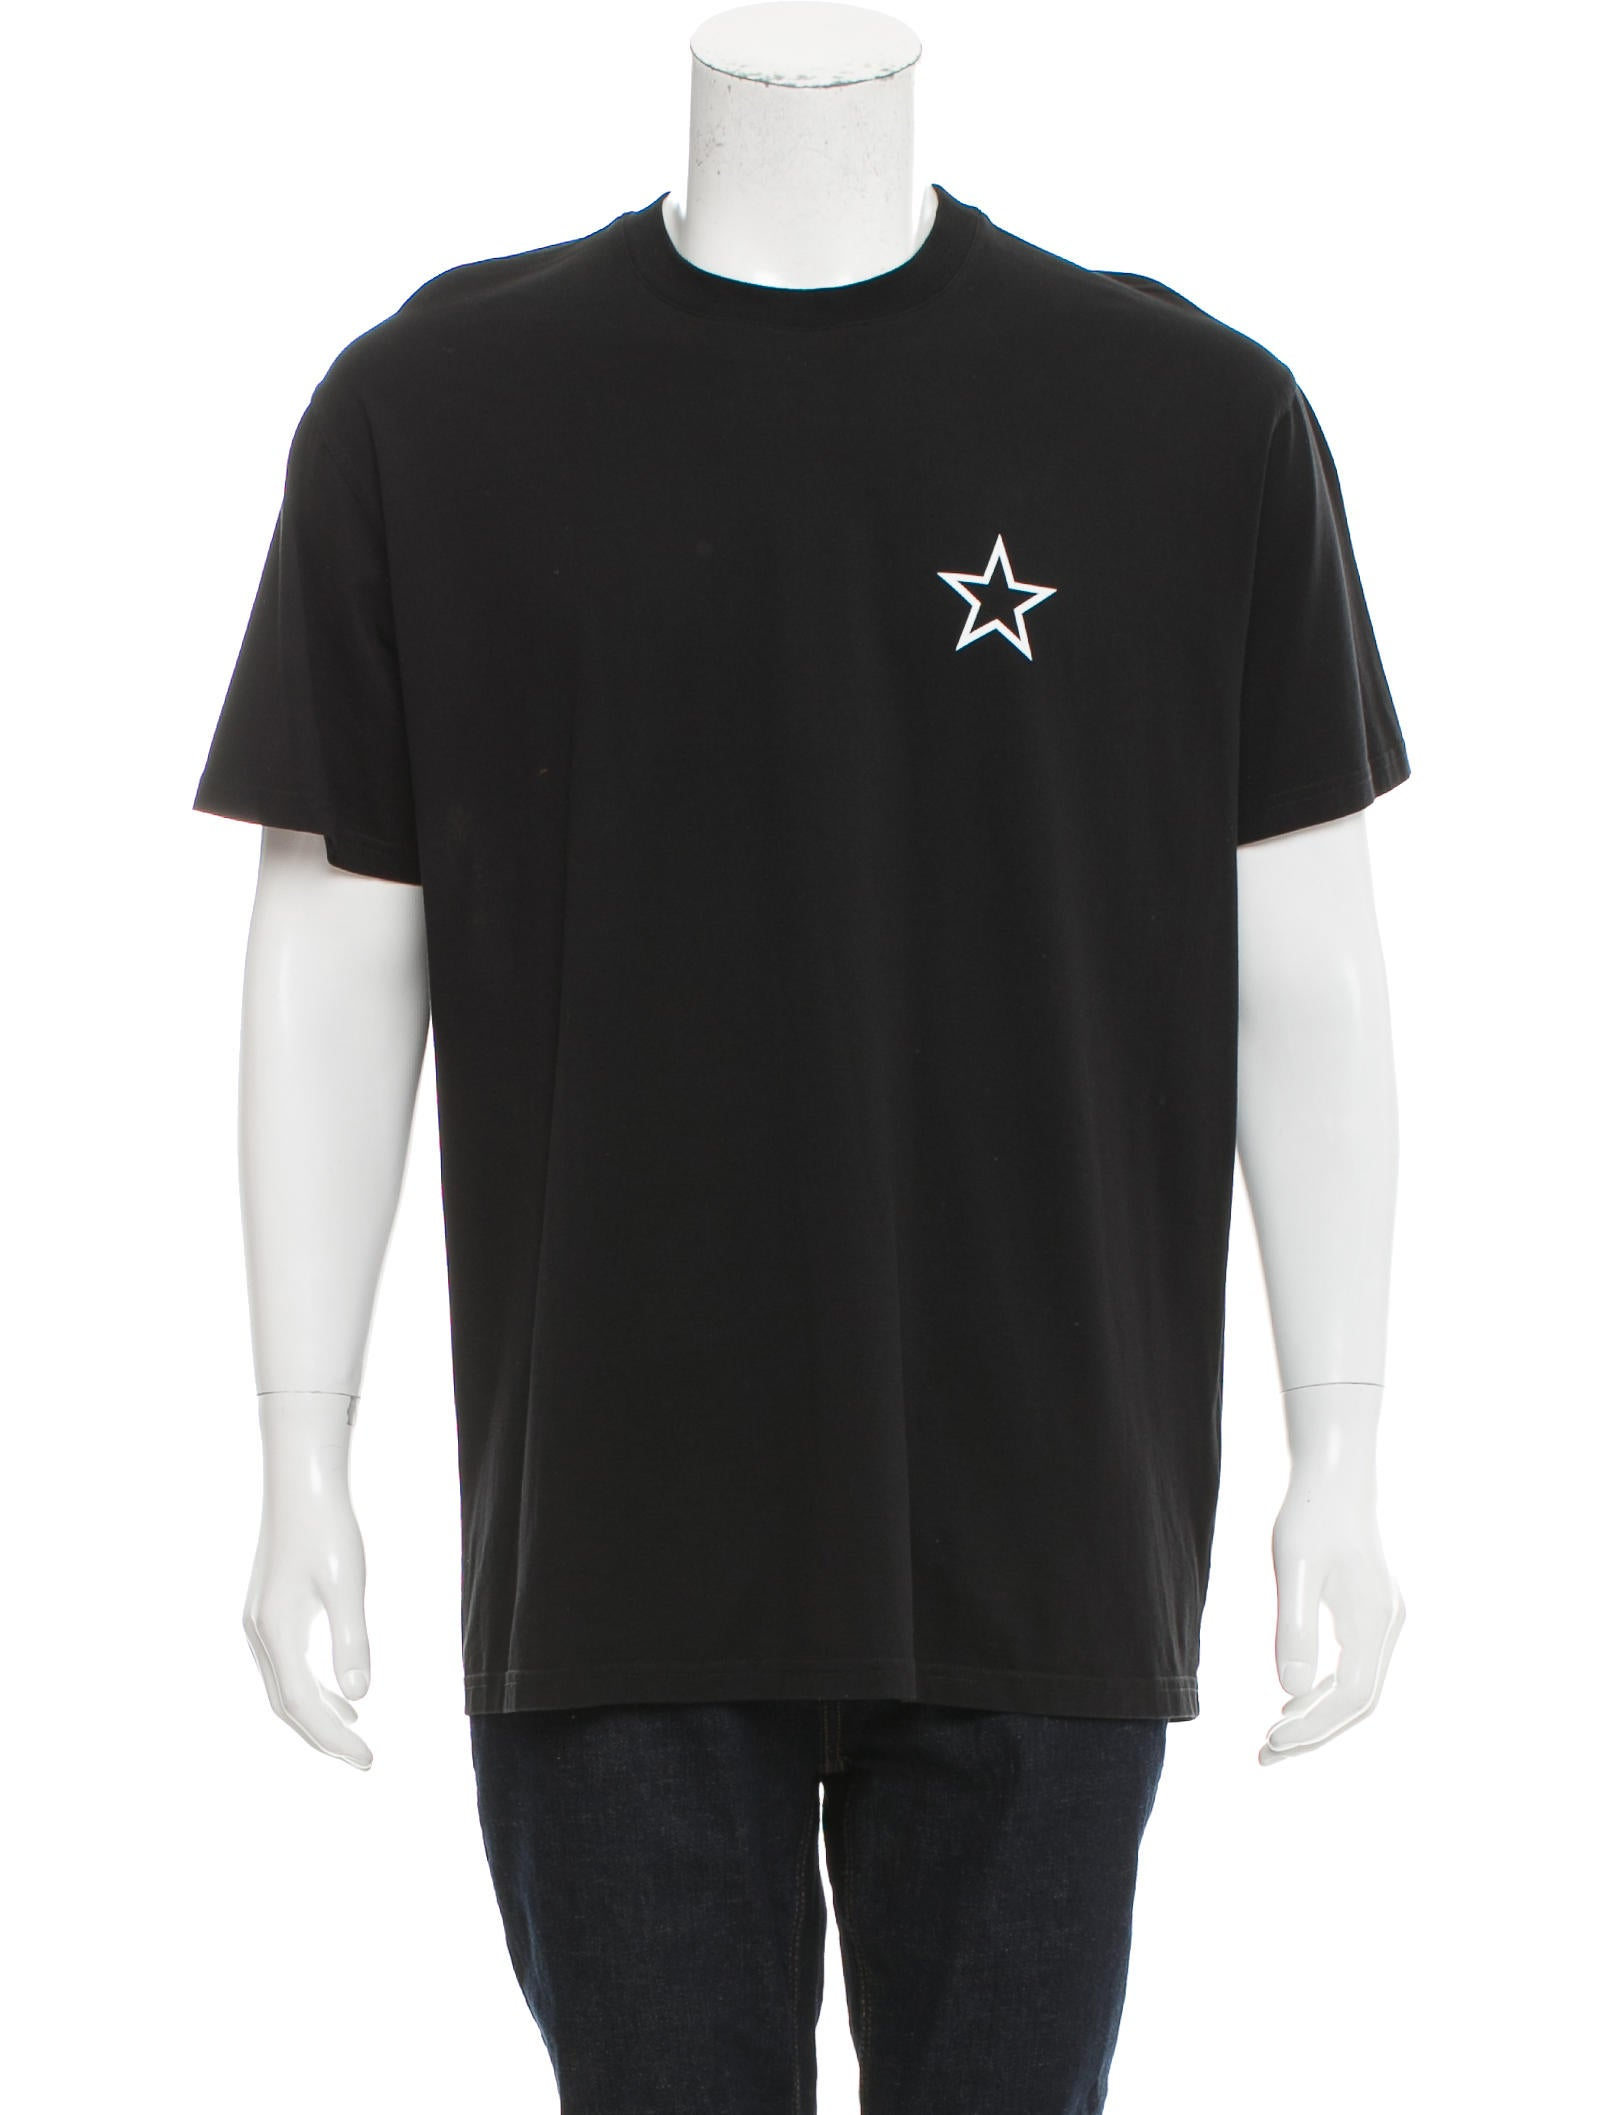 Givenchy 206 star print t shirt clothing giv41504 for Givenchy star t shirt